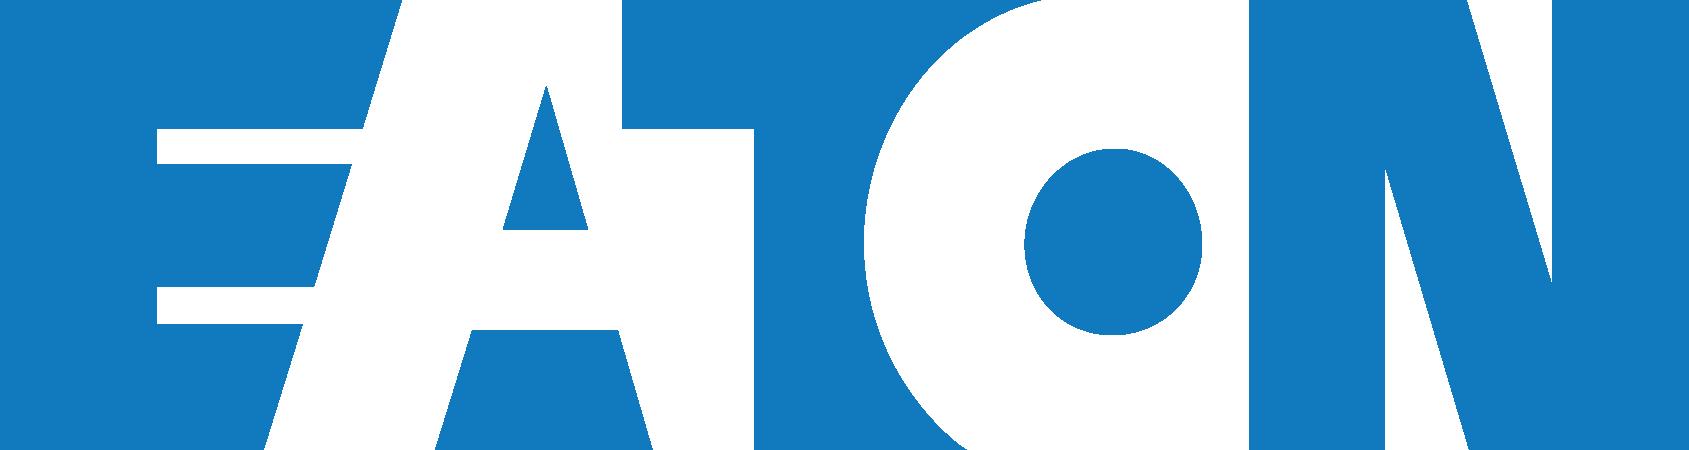 Eaton Logo png